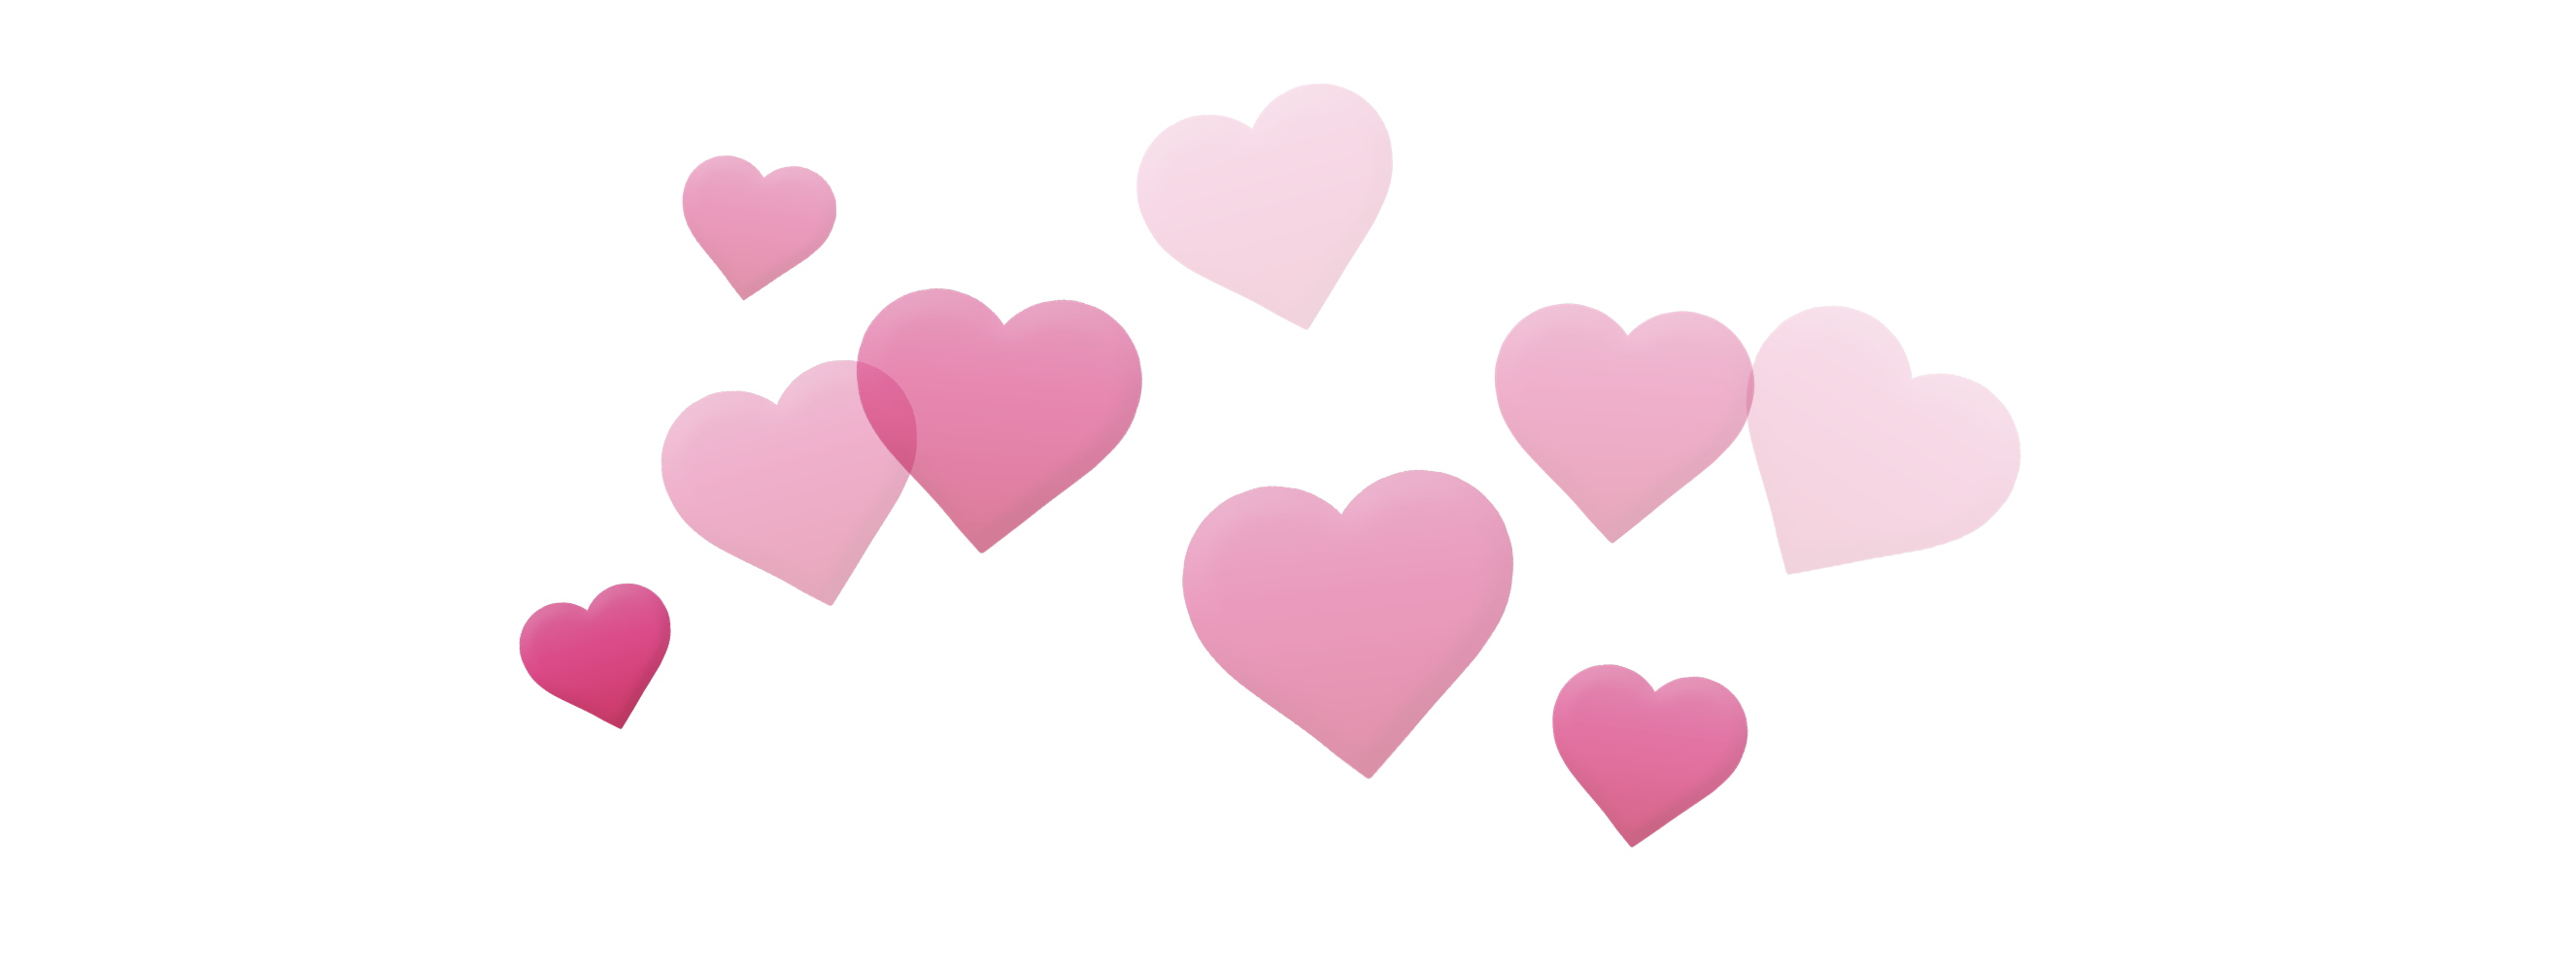 Photo booth hearts png, Photo booth hearts png Transparent.